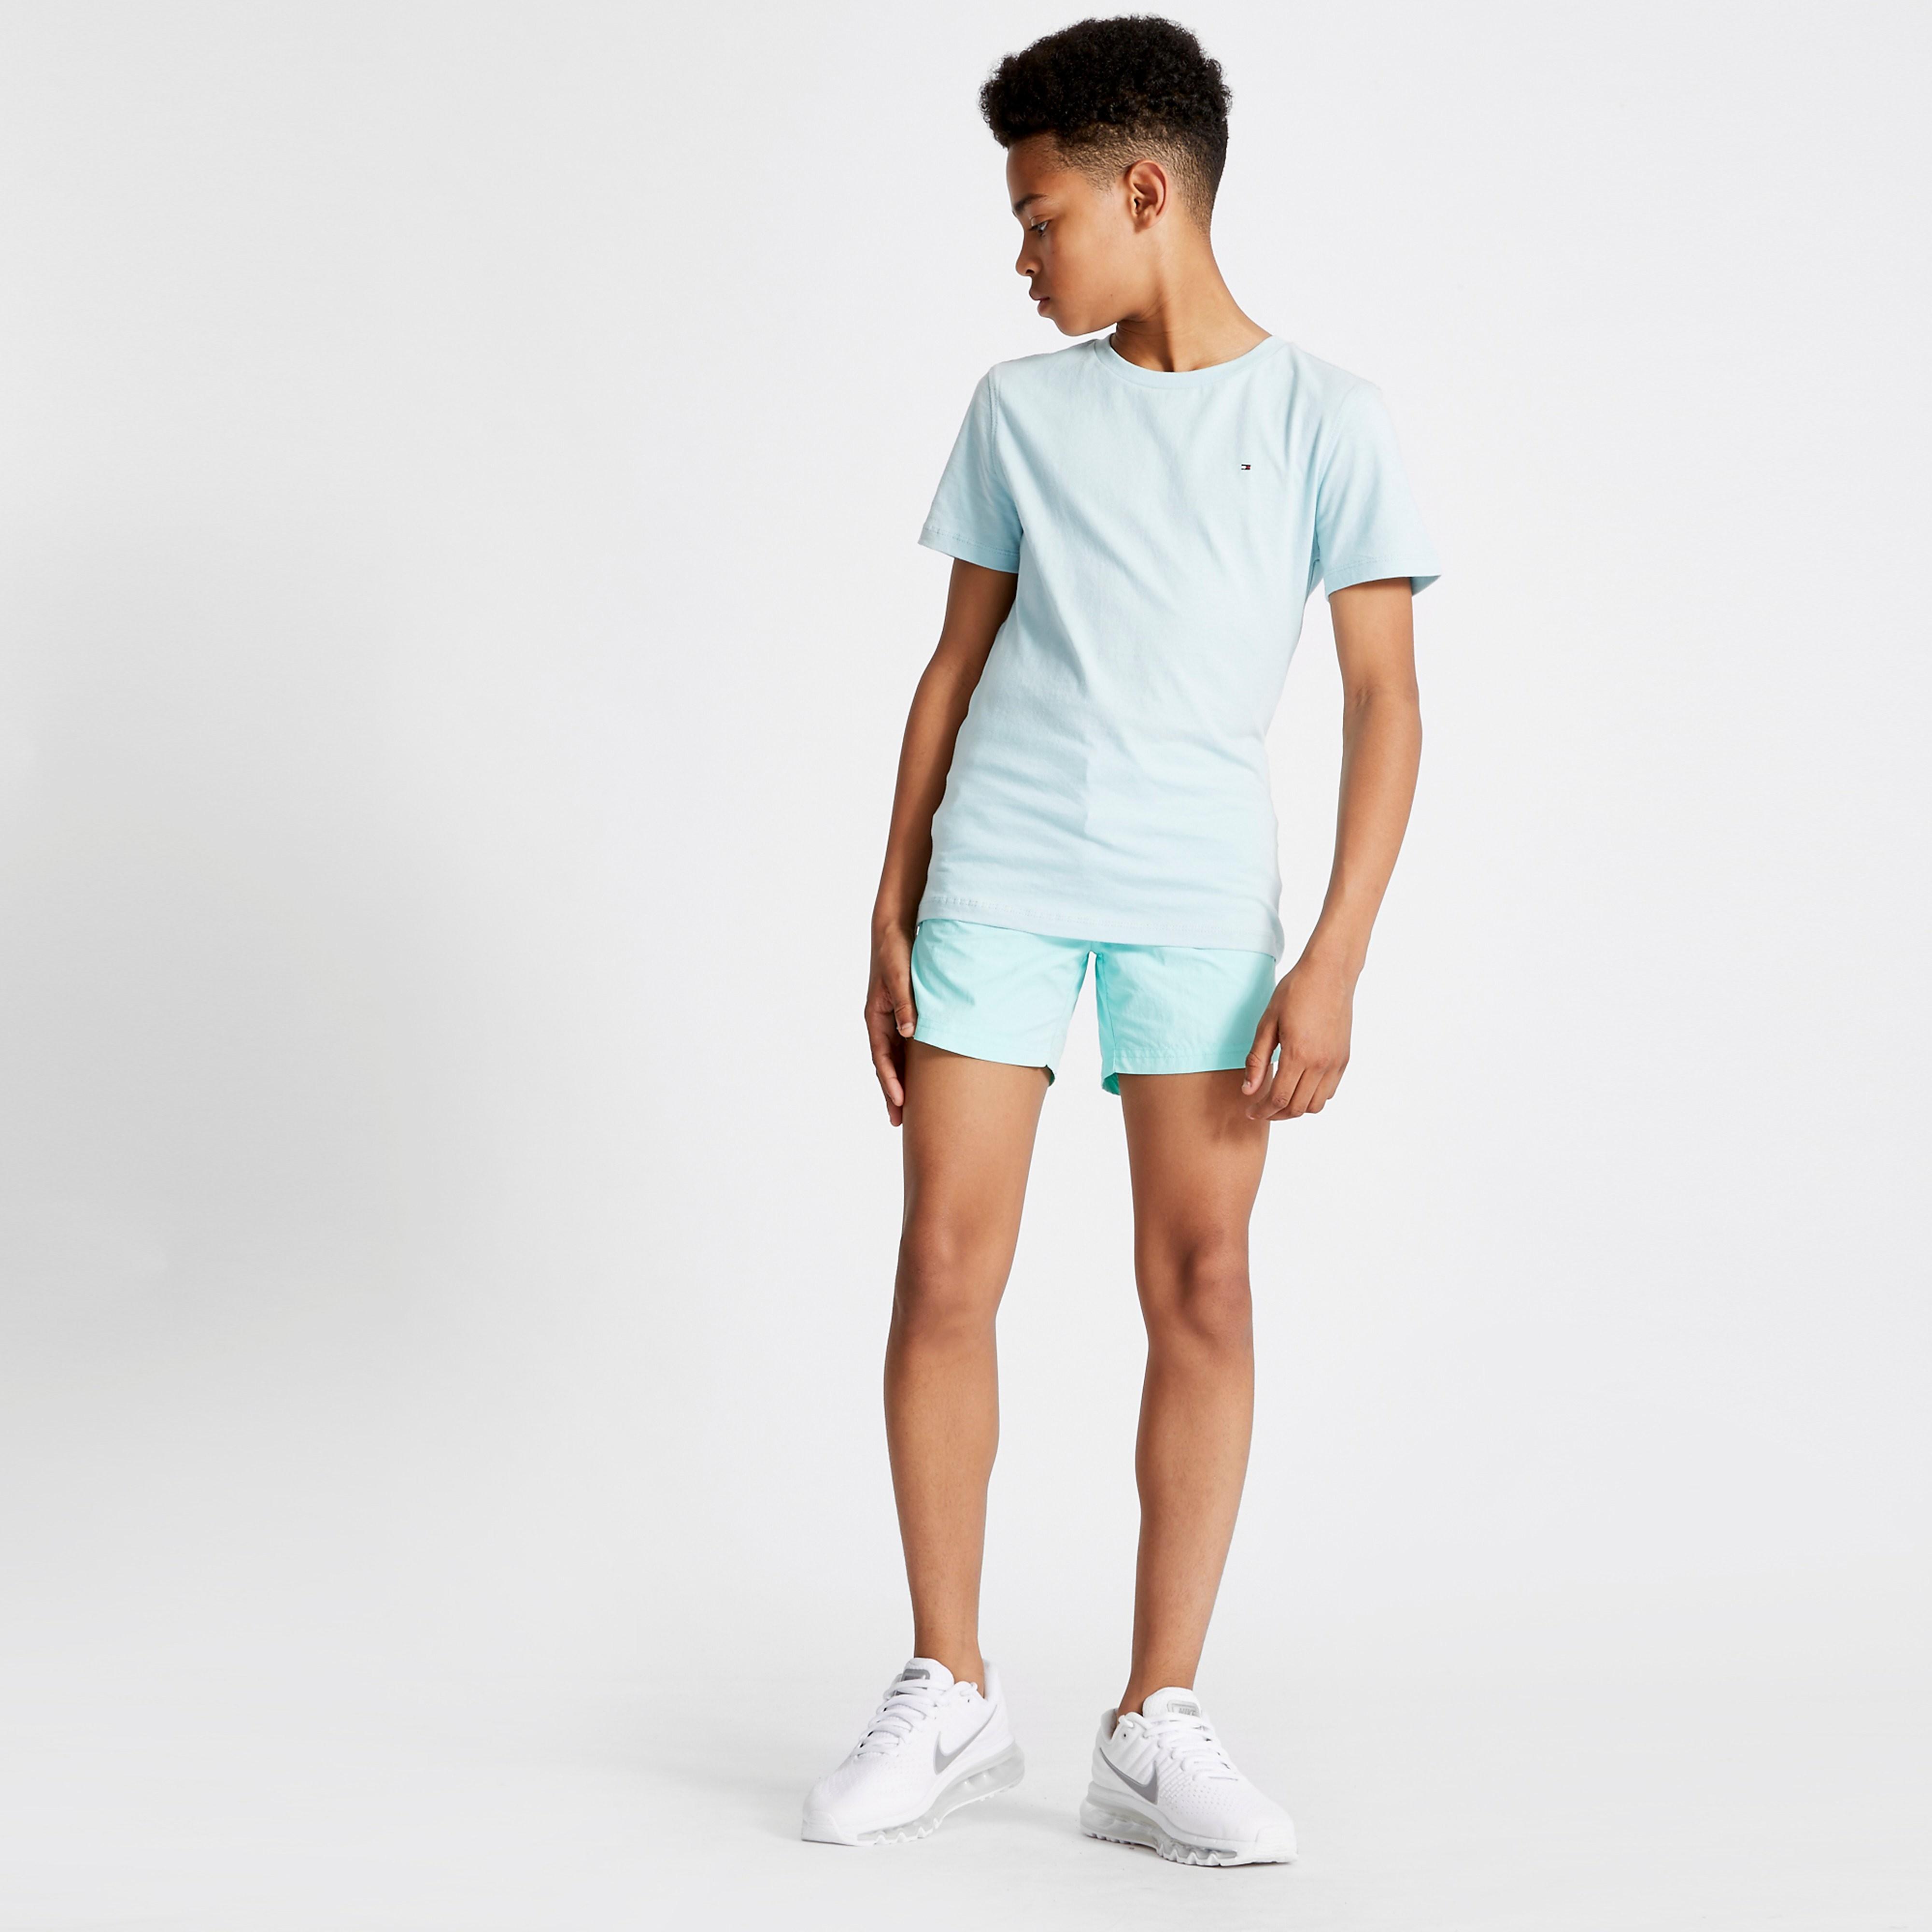 Tommy Hilfiger Small Flag T-Shirt Junior